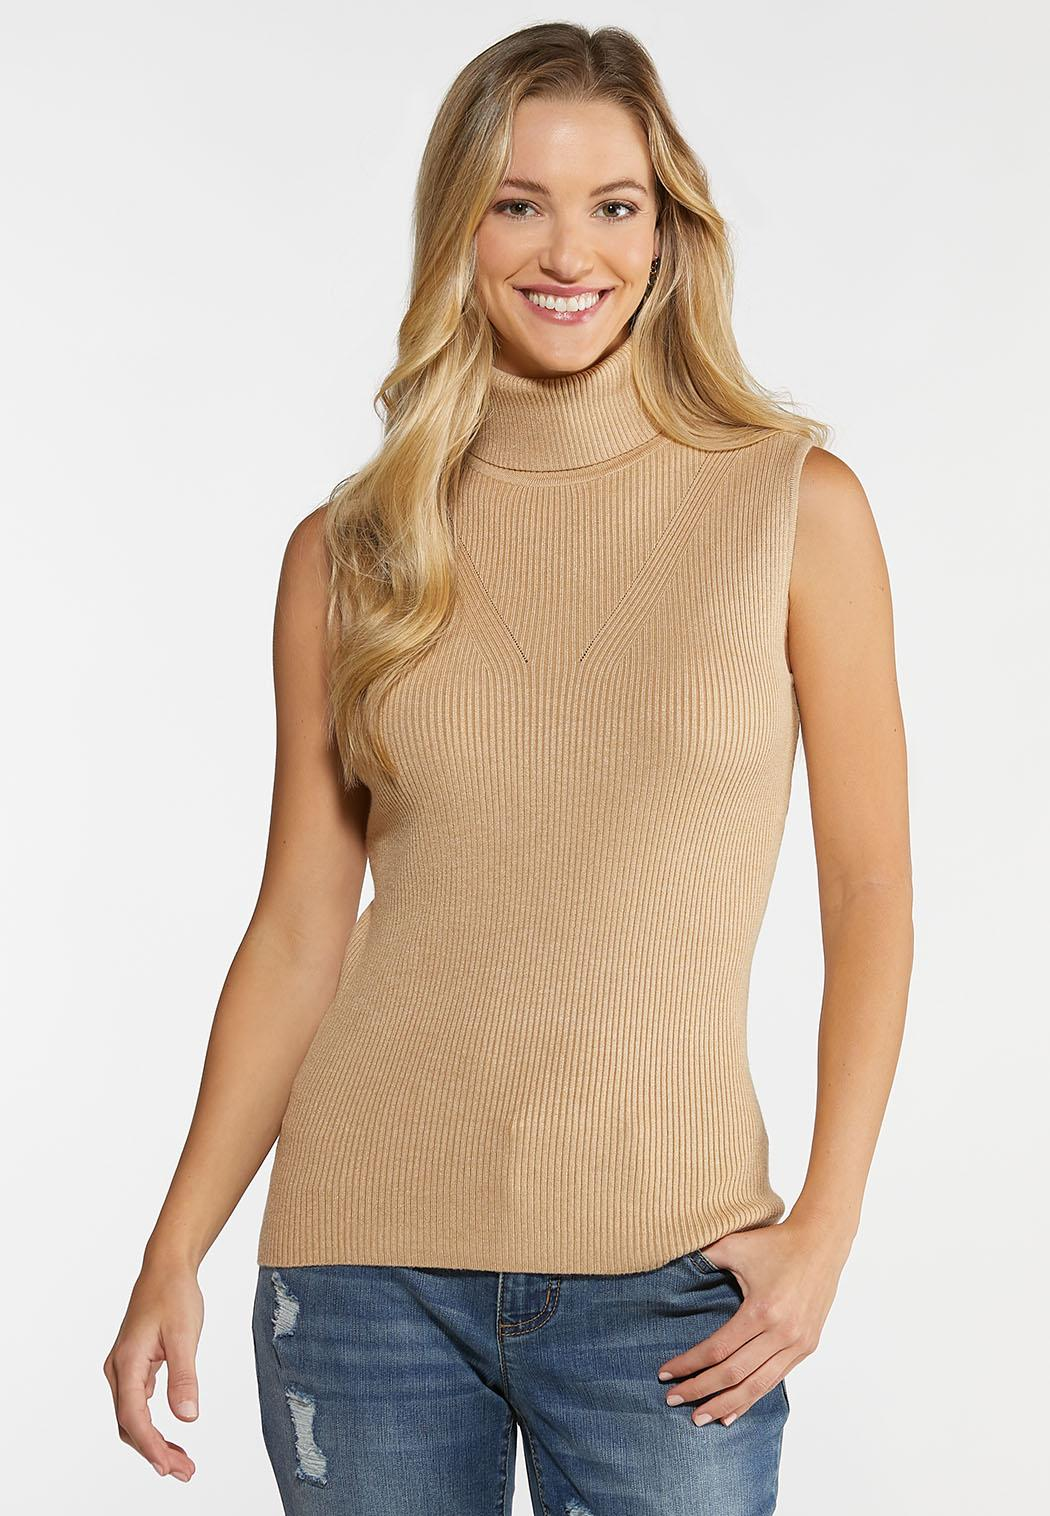 Turtleneck Sweater Tank